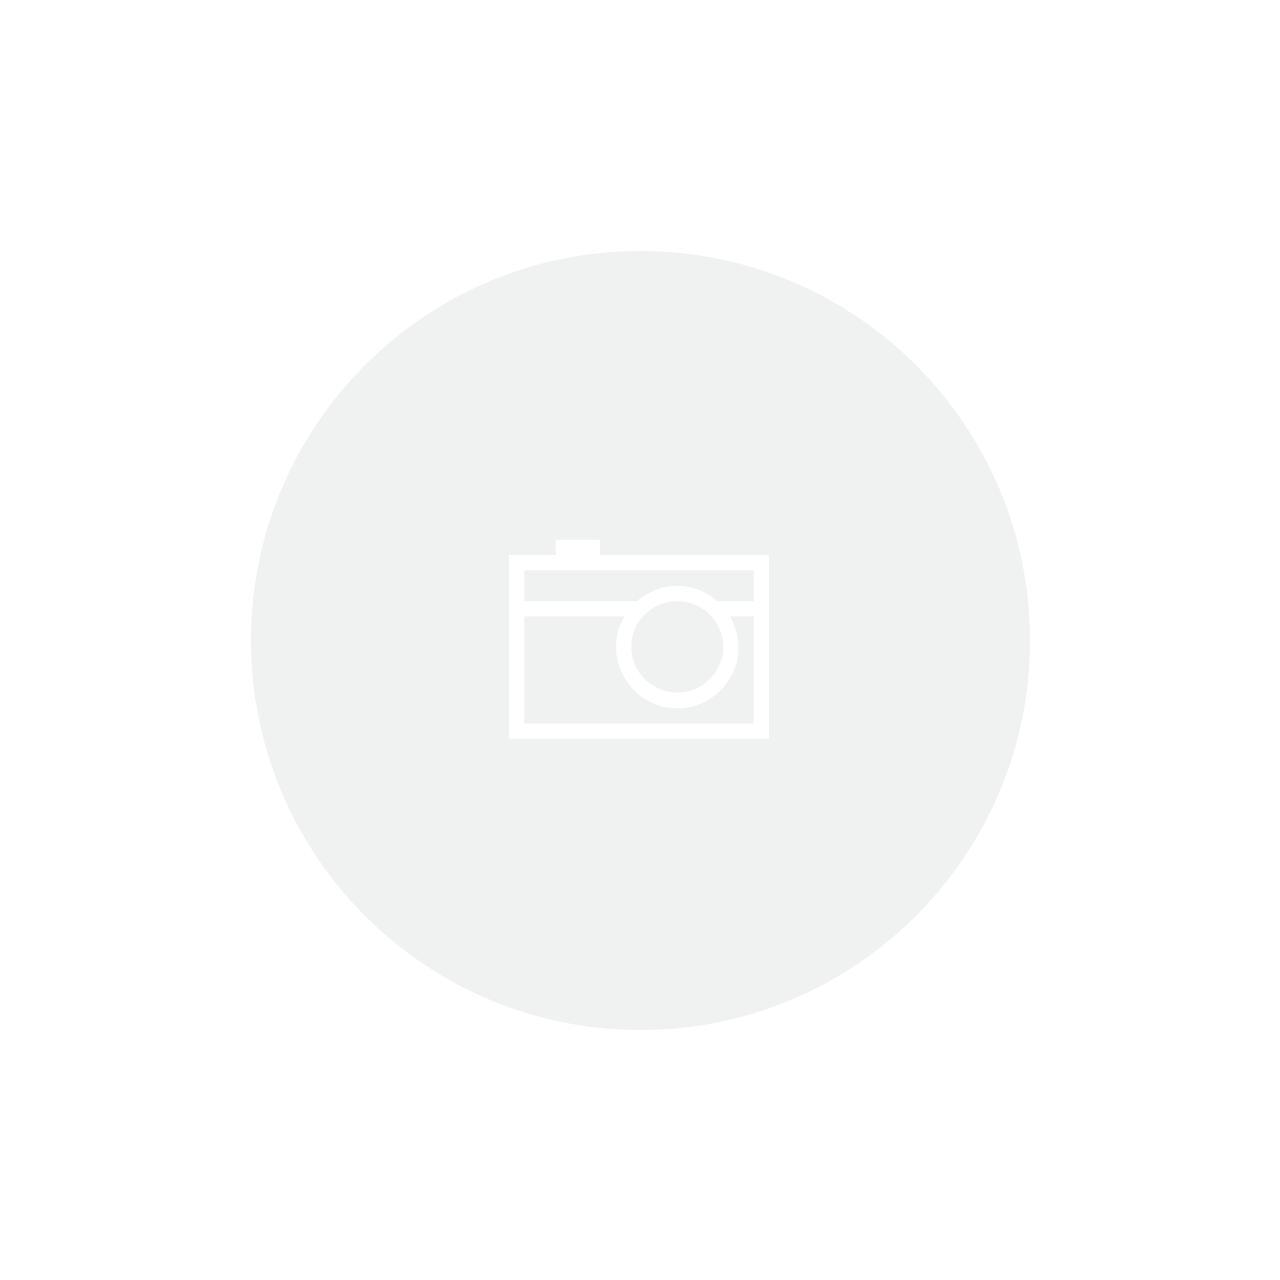 Bandeja Inox Retangular 42x29 cm Classic Tramontina